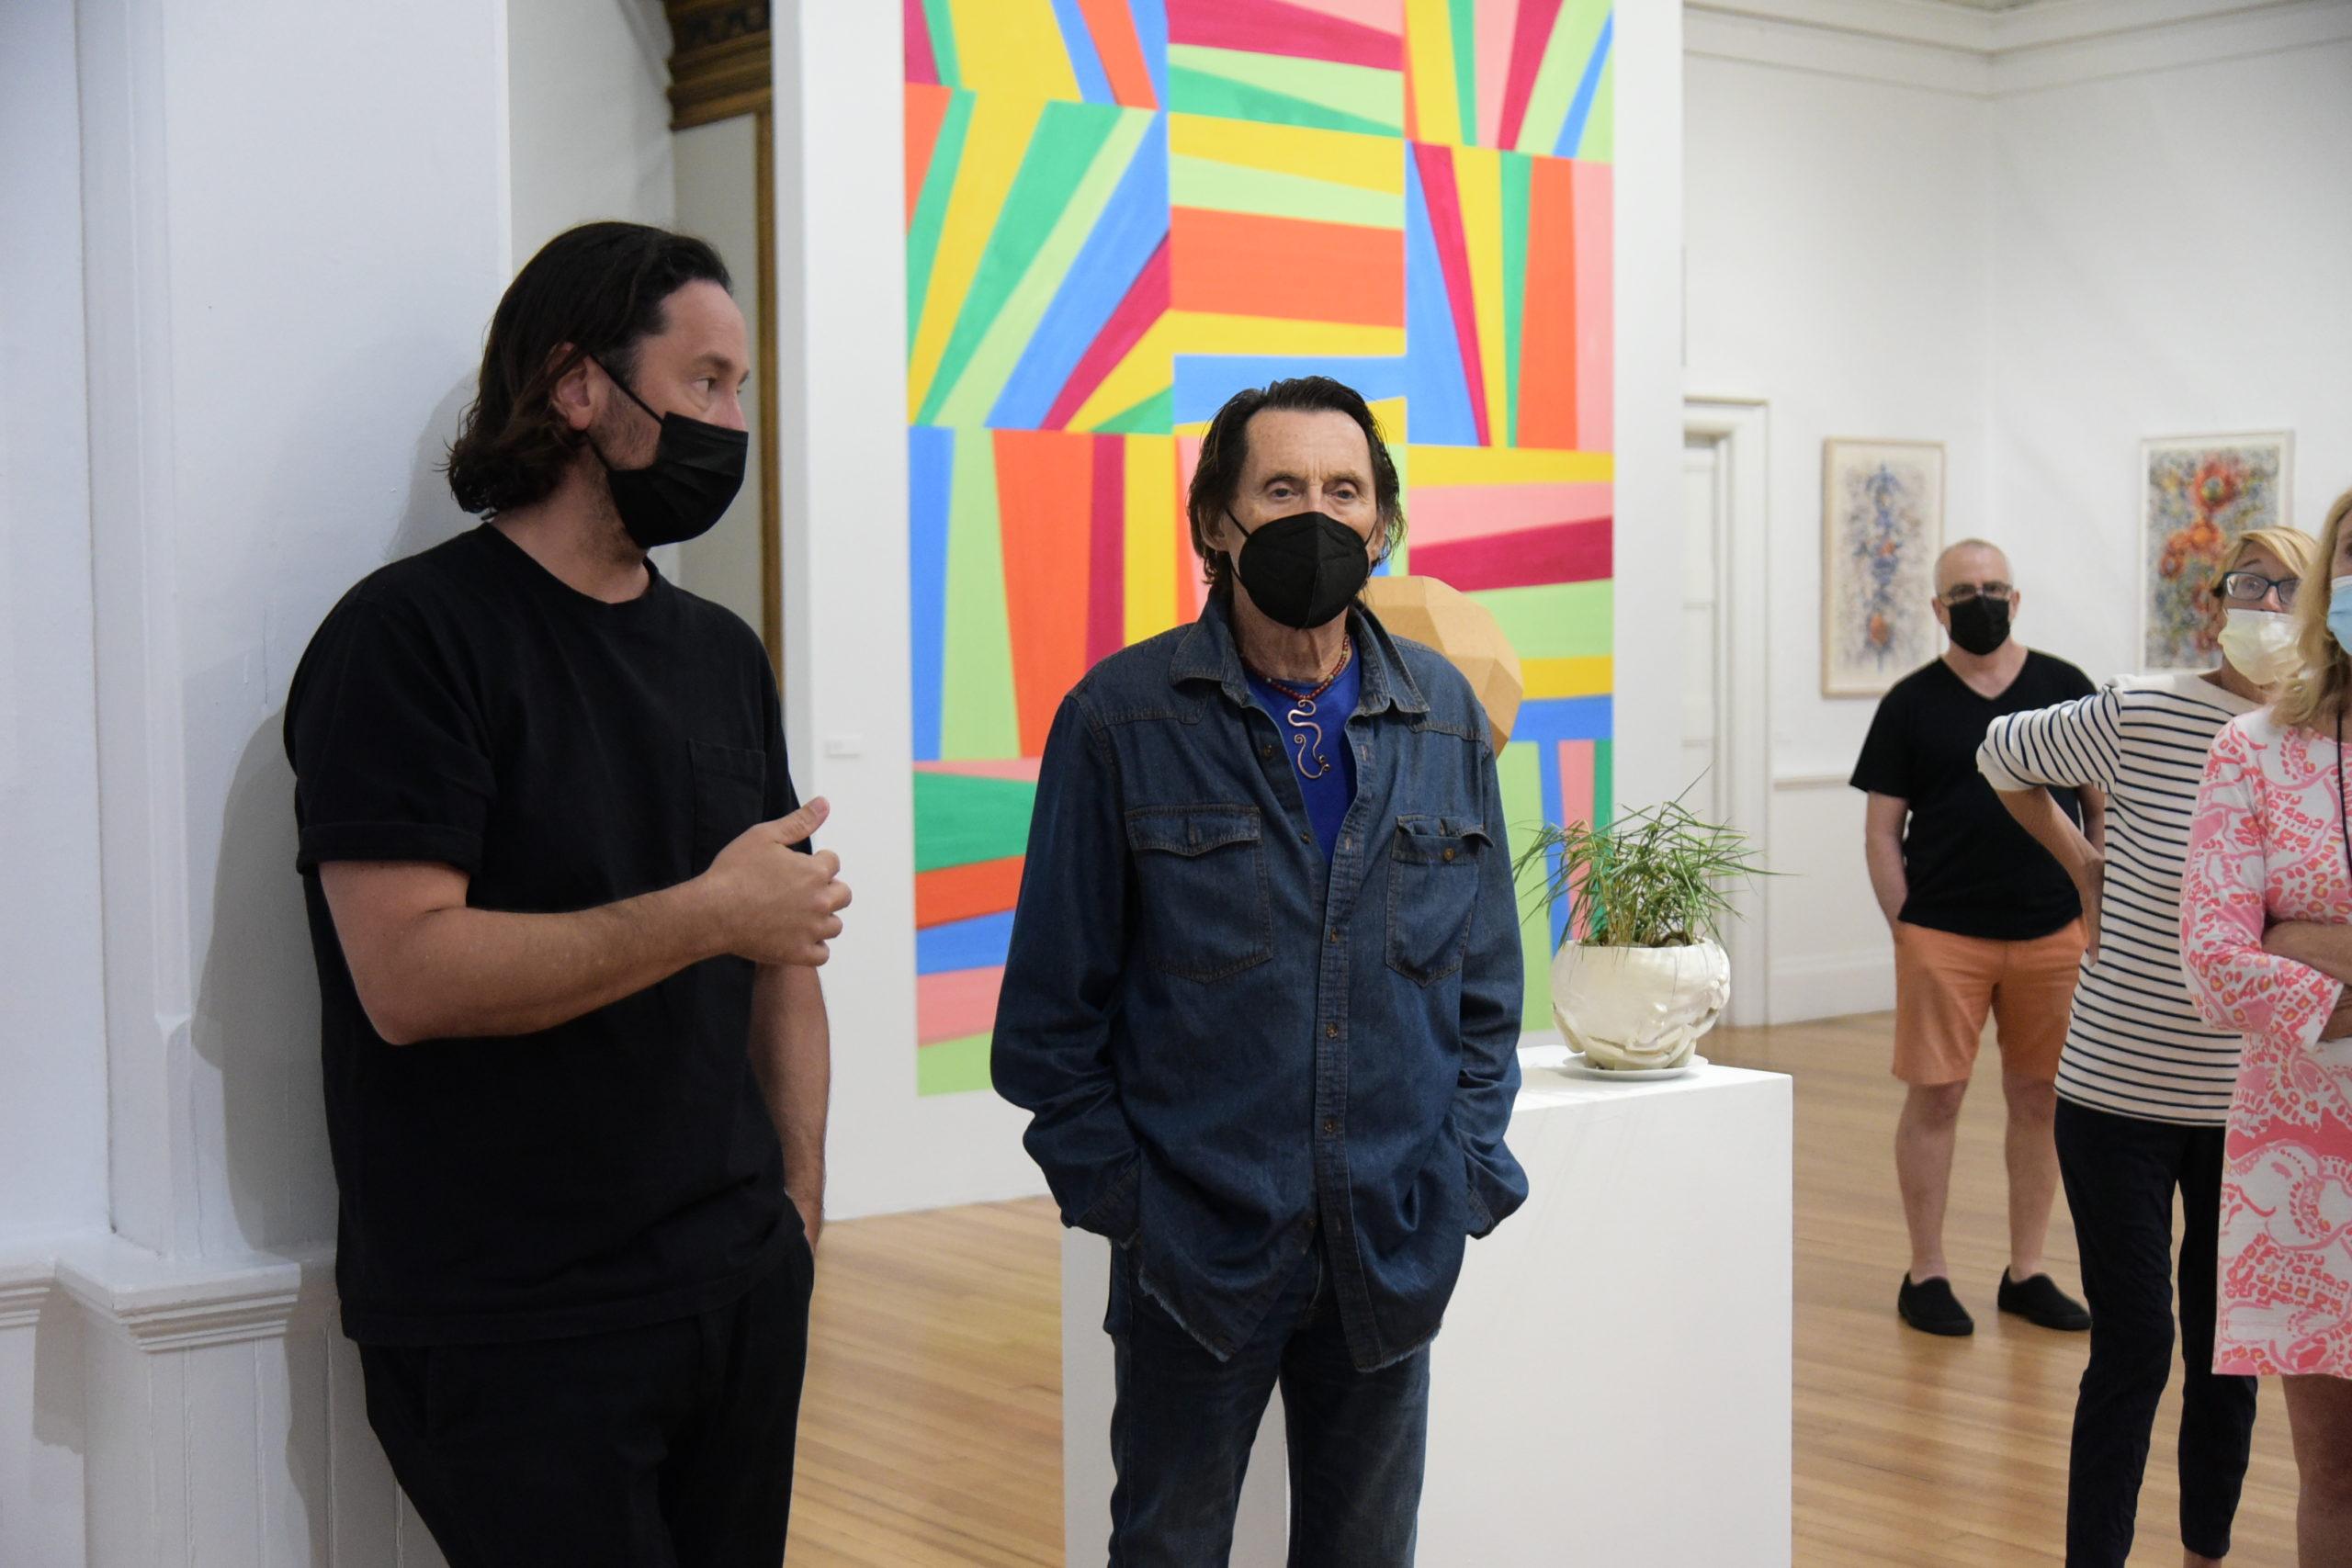 Curator Jay Davis and Amagansett artist Will Ryan touring